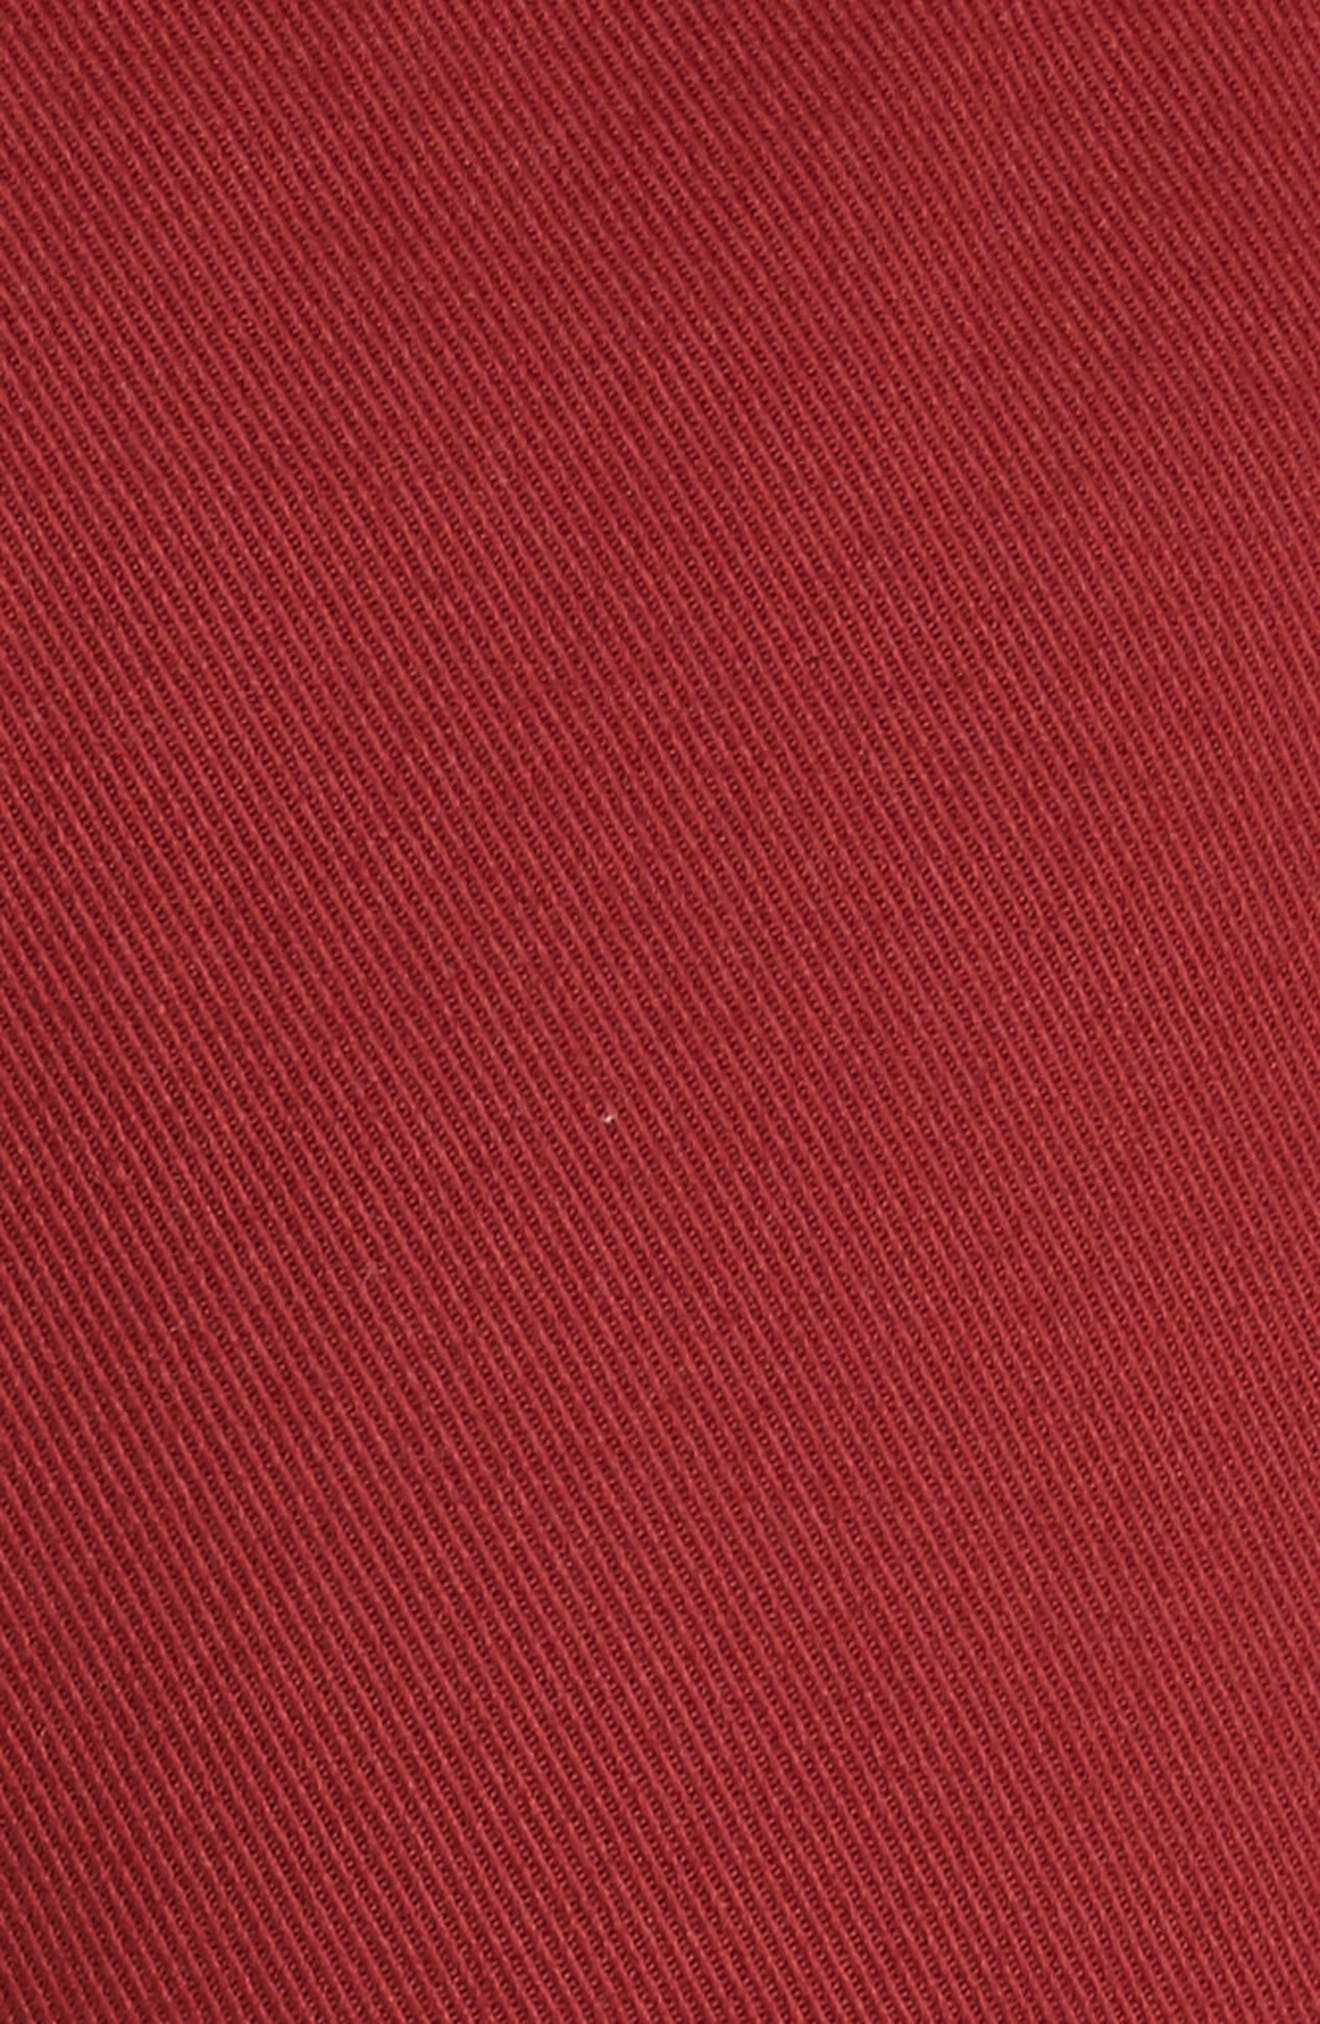 Ruffle Trim Drawstring Trousers,                             Alternate thumbnail 5, color,                             601